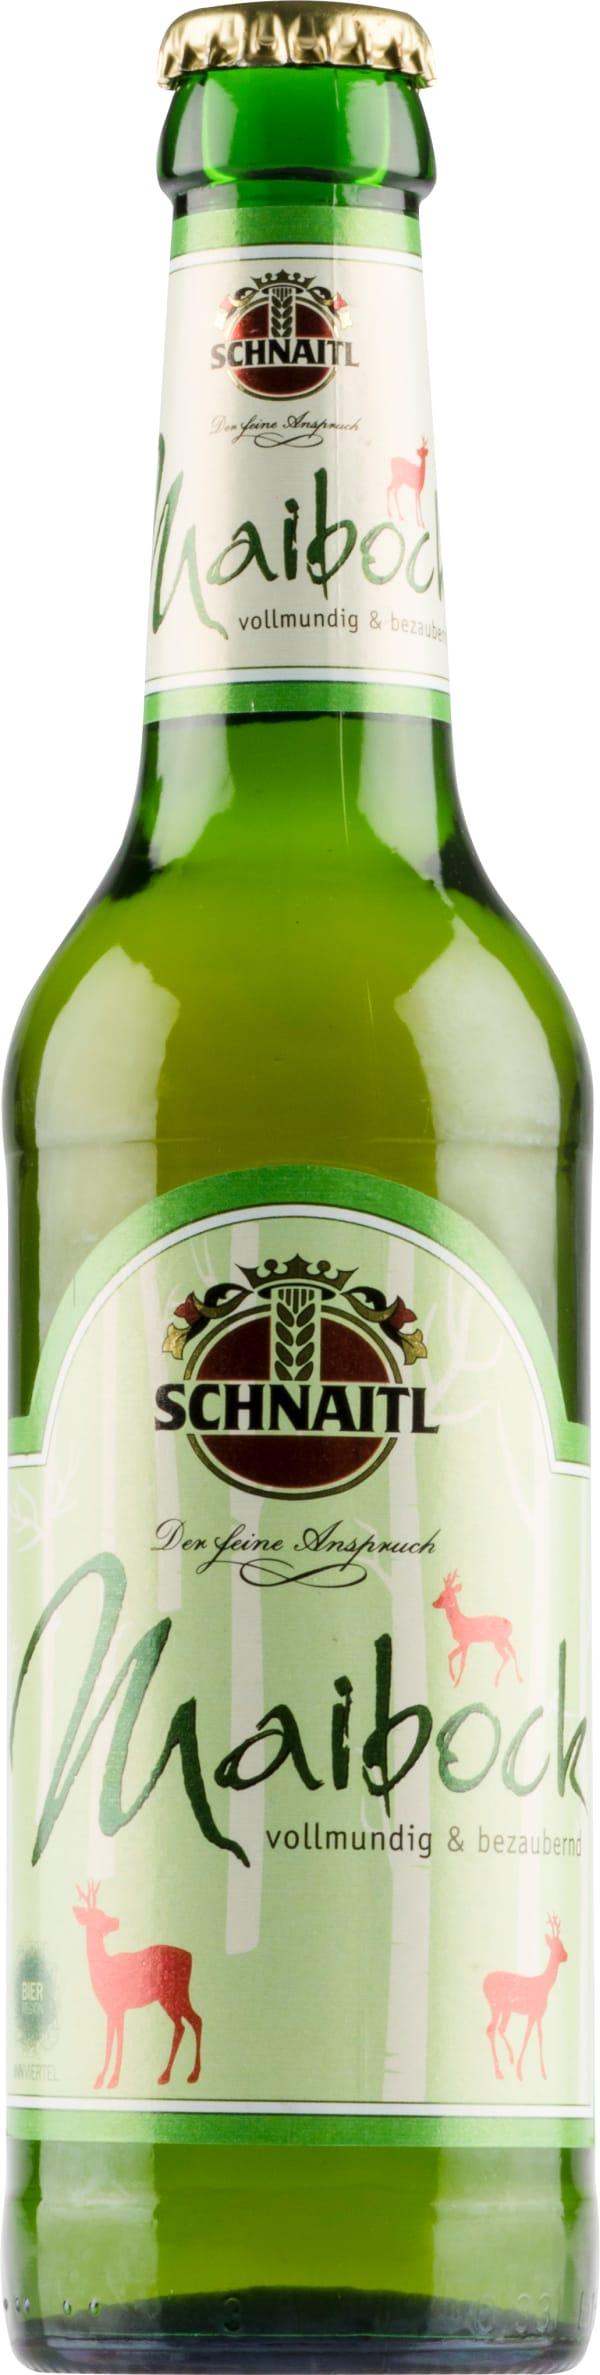 Schnaitl Maibock